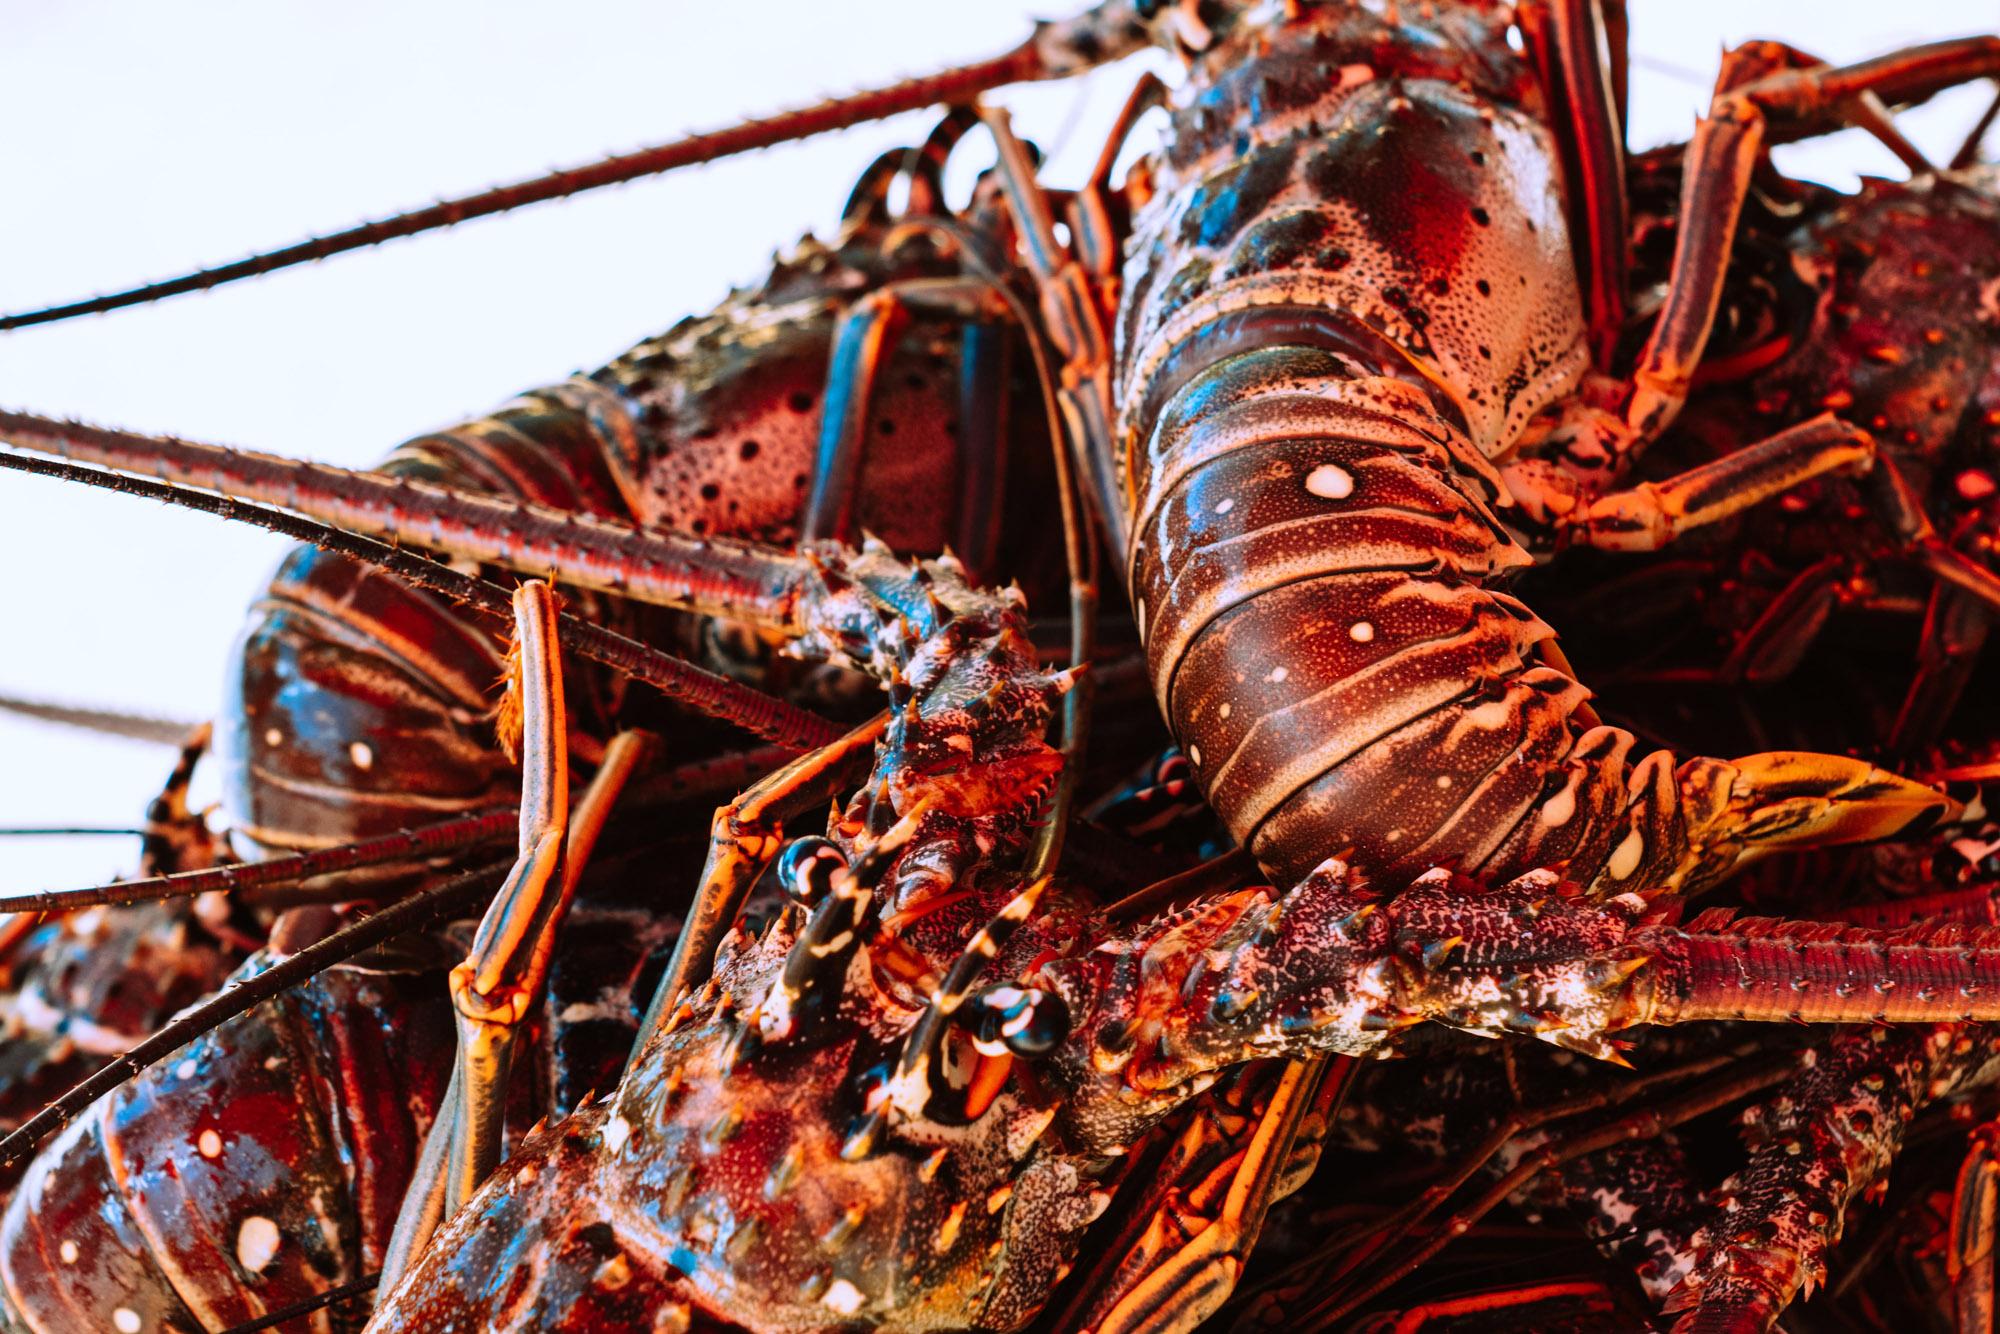 Fresh lobster at The Dornie | Seafood restaurant Skye